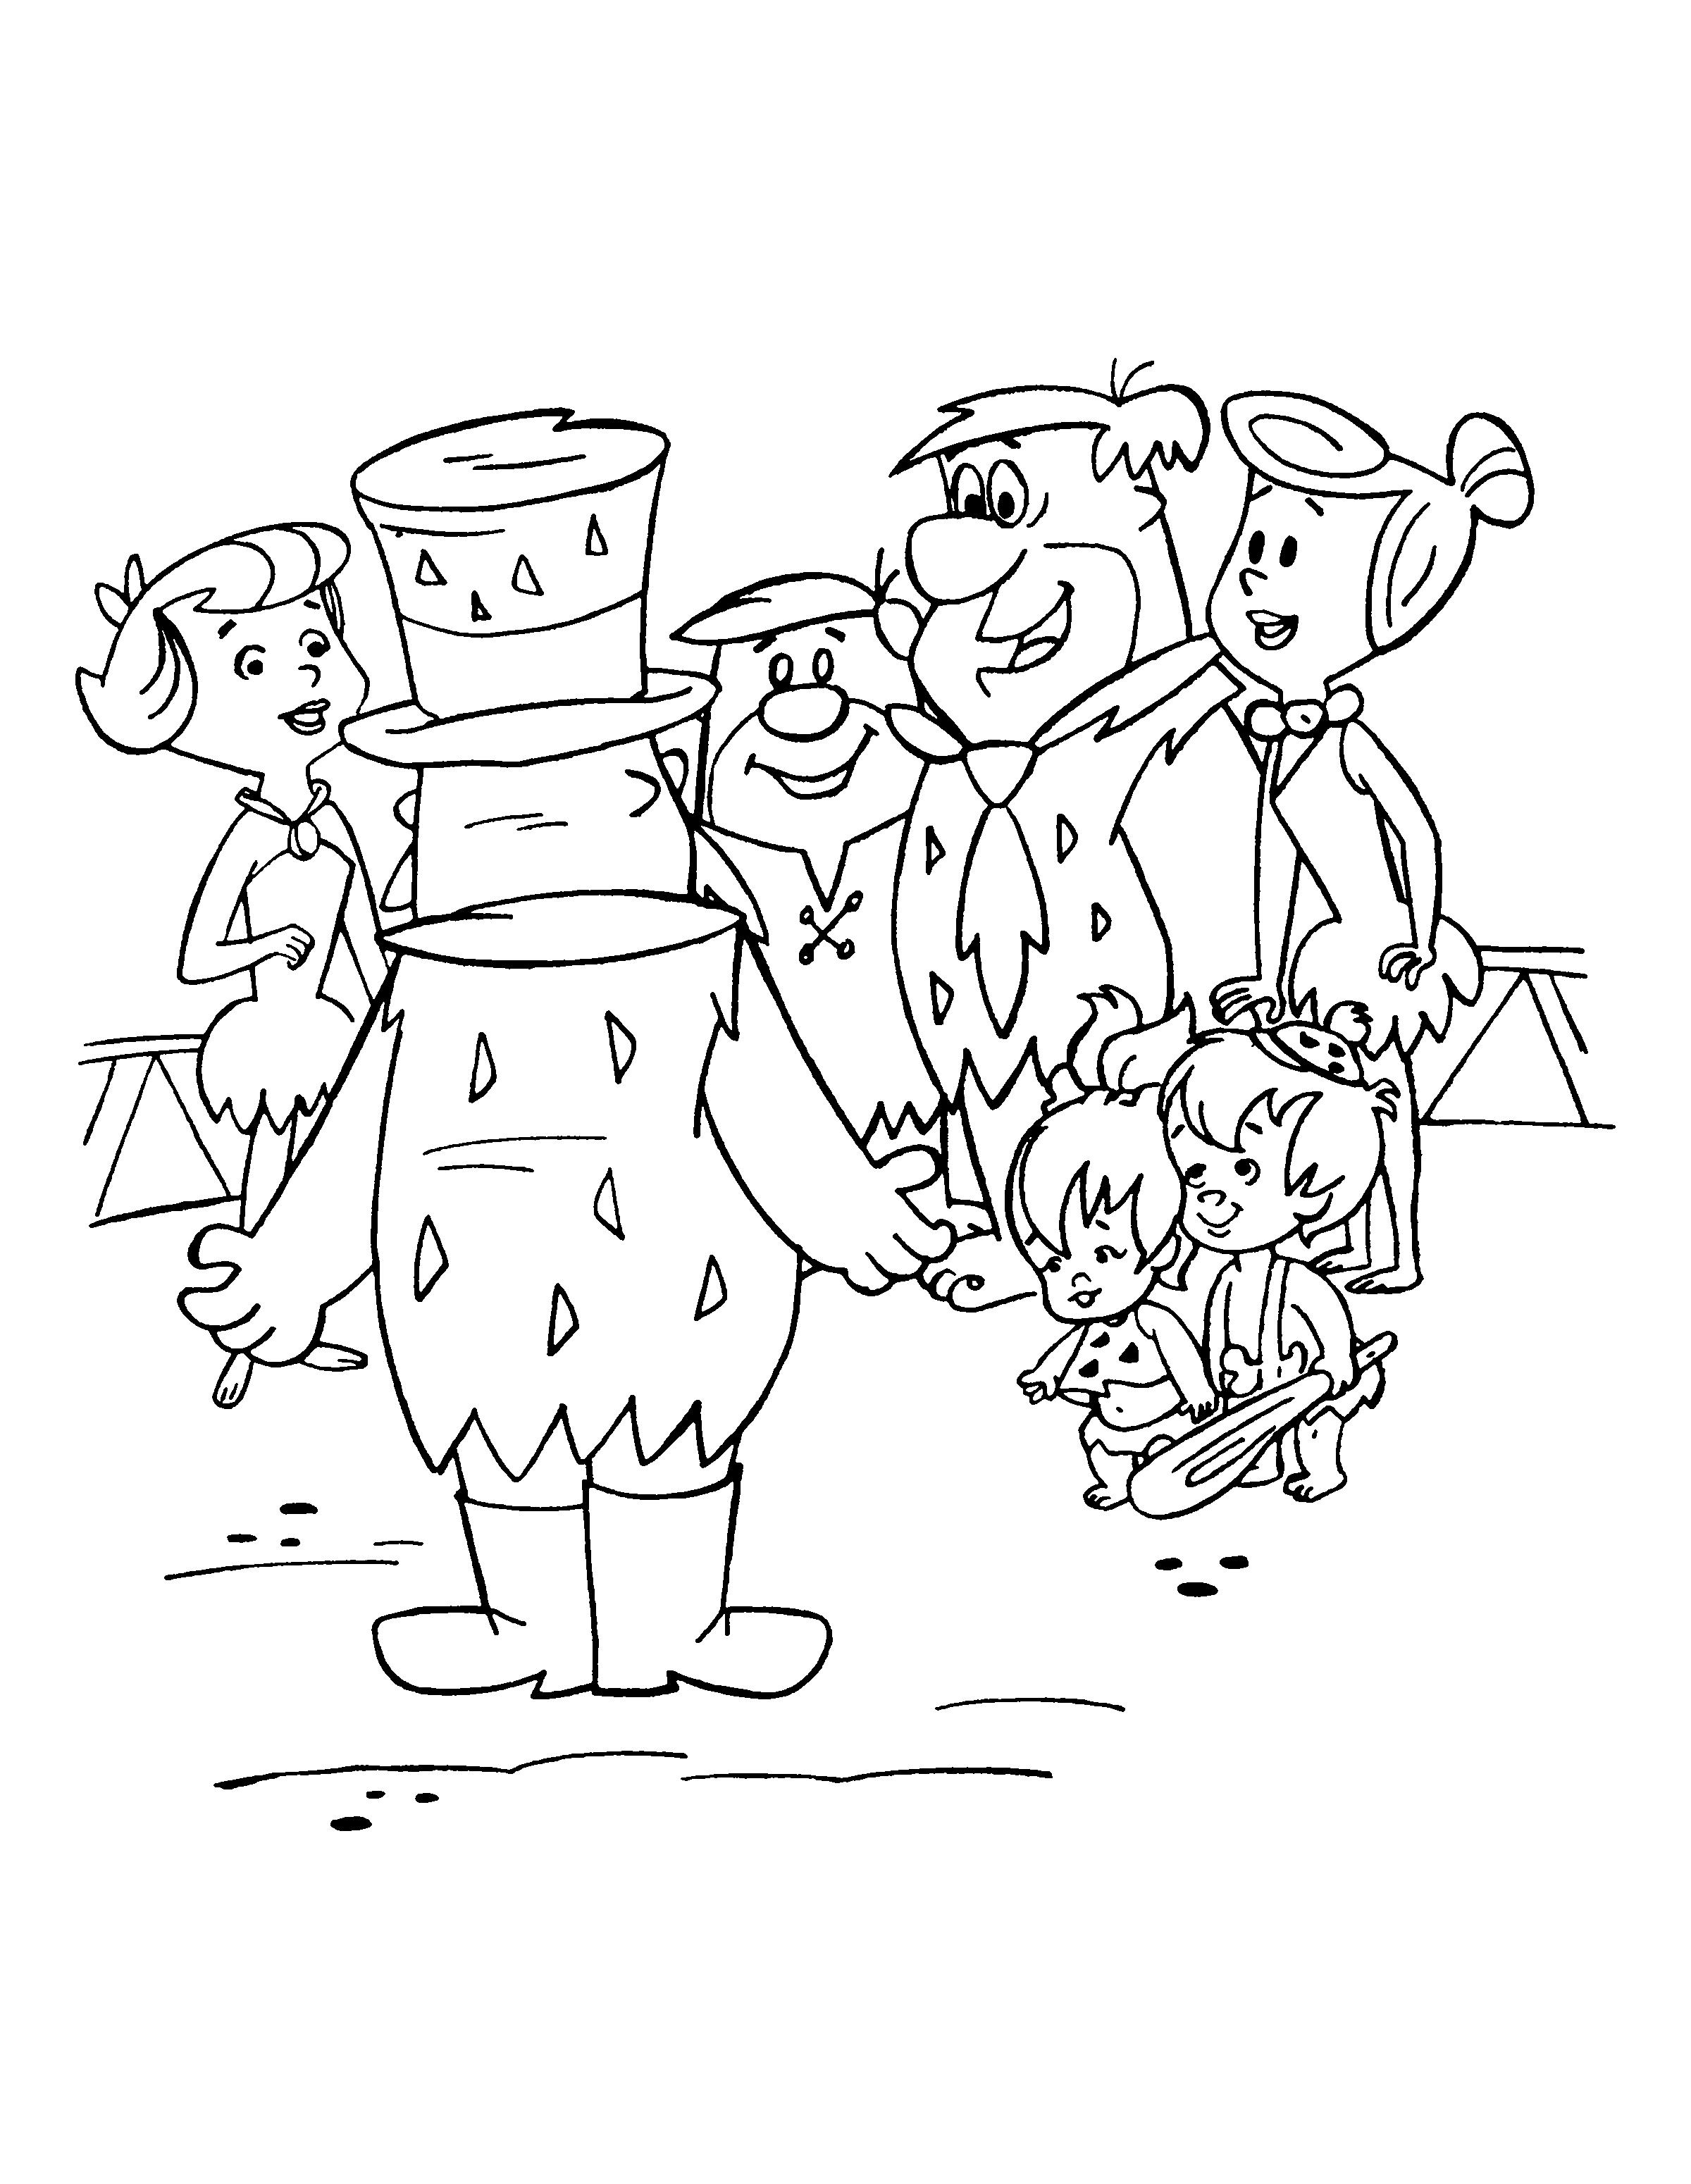 Flintstones 29556 Cartoons Printable Coloring Pages